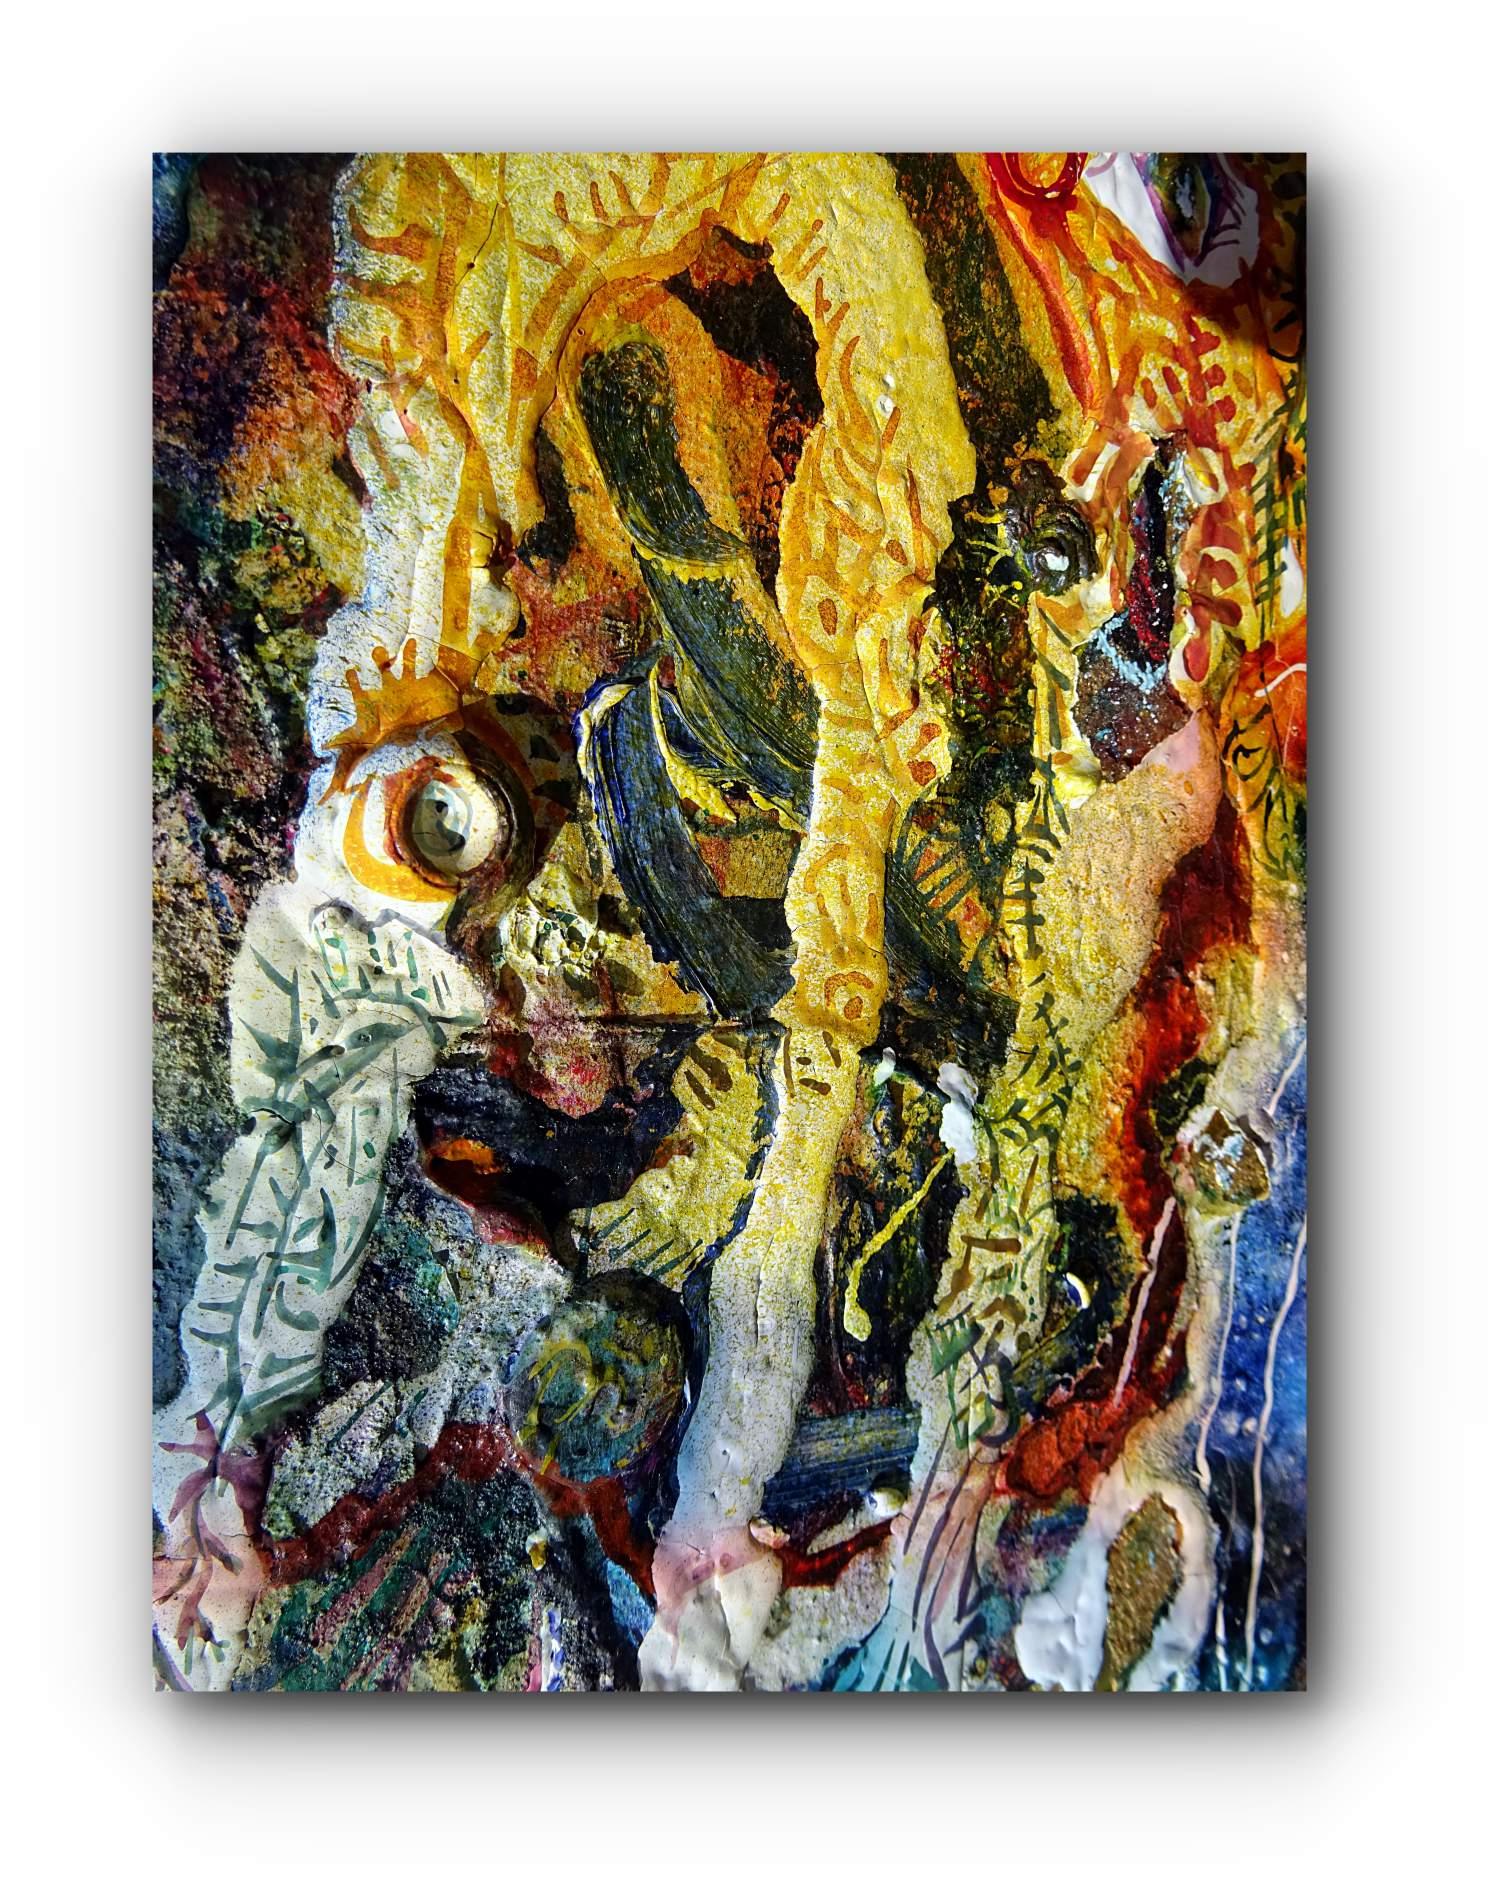 painting-detail-3-kiss-artist-duo-ingress-vortices.jpg